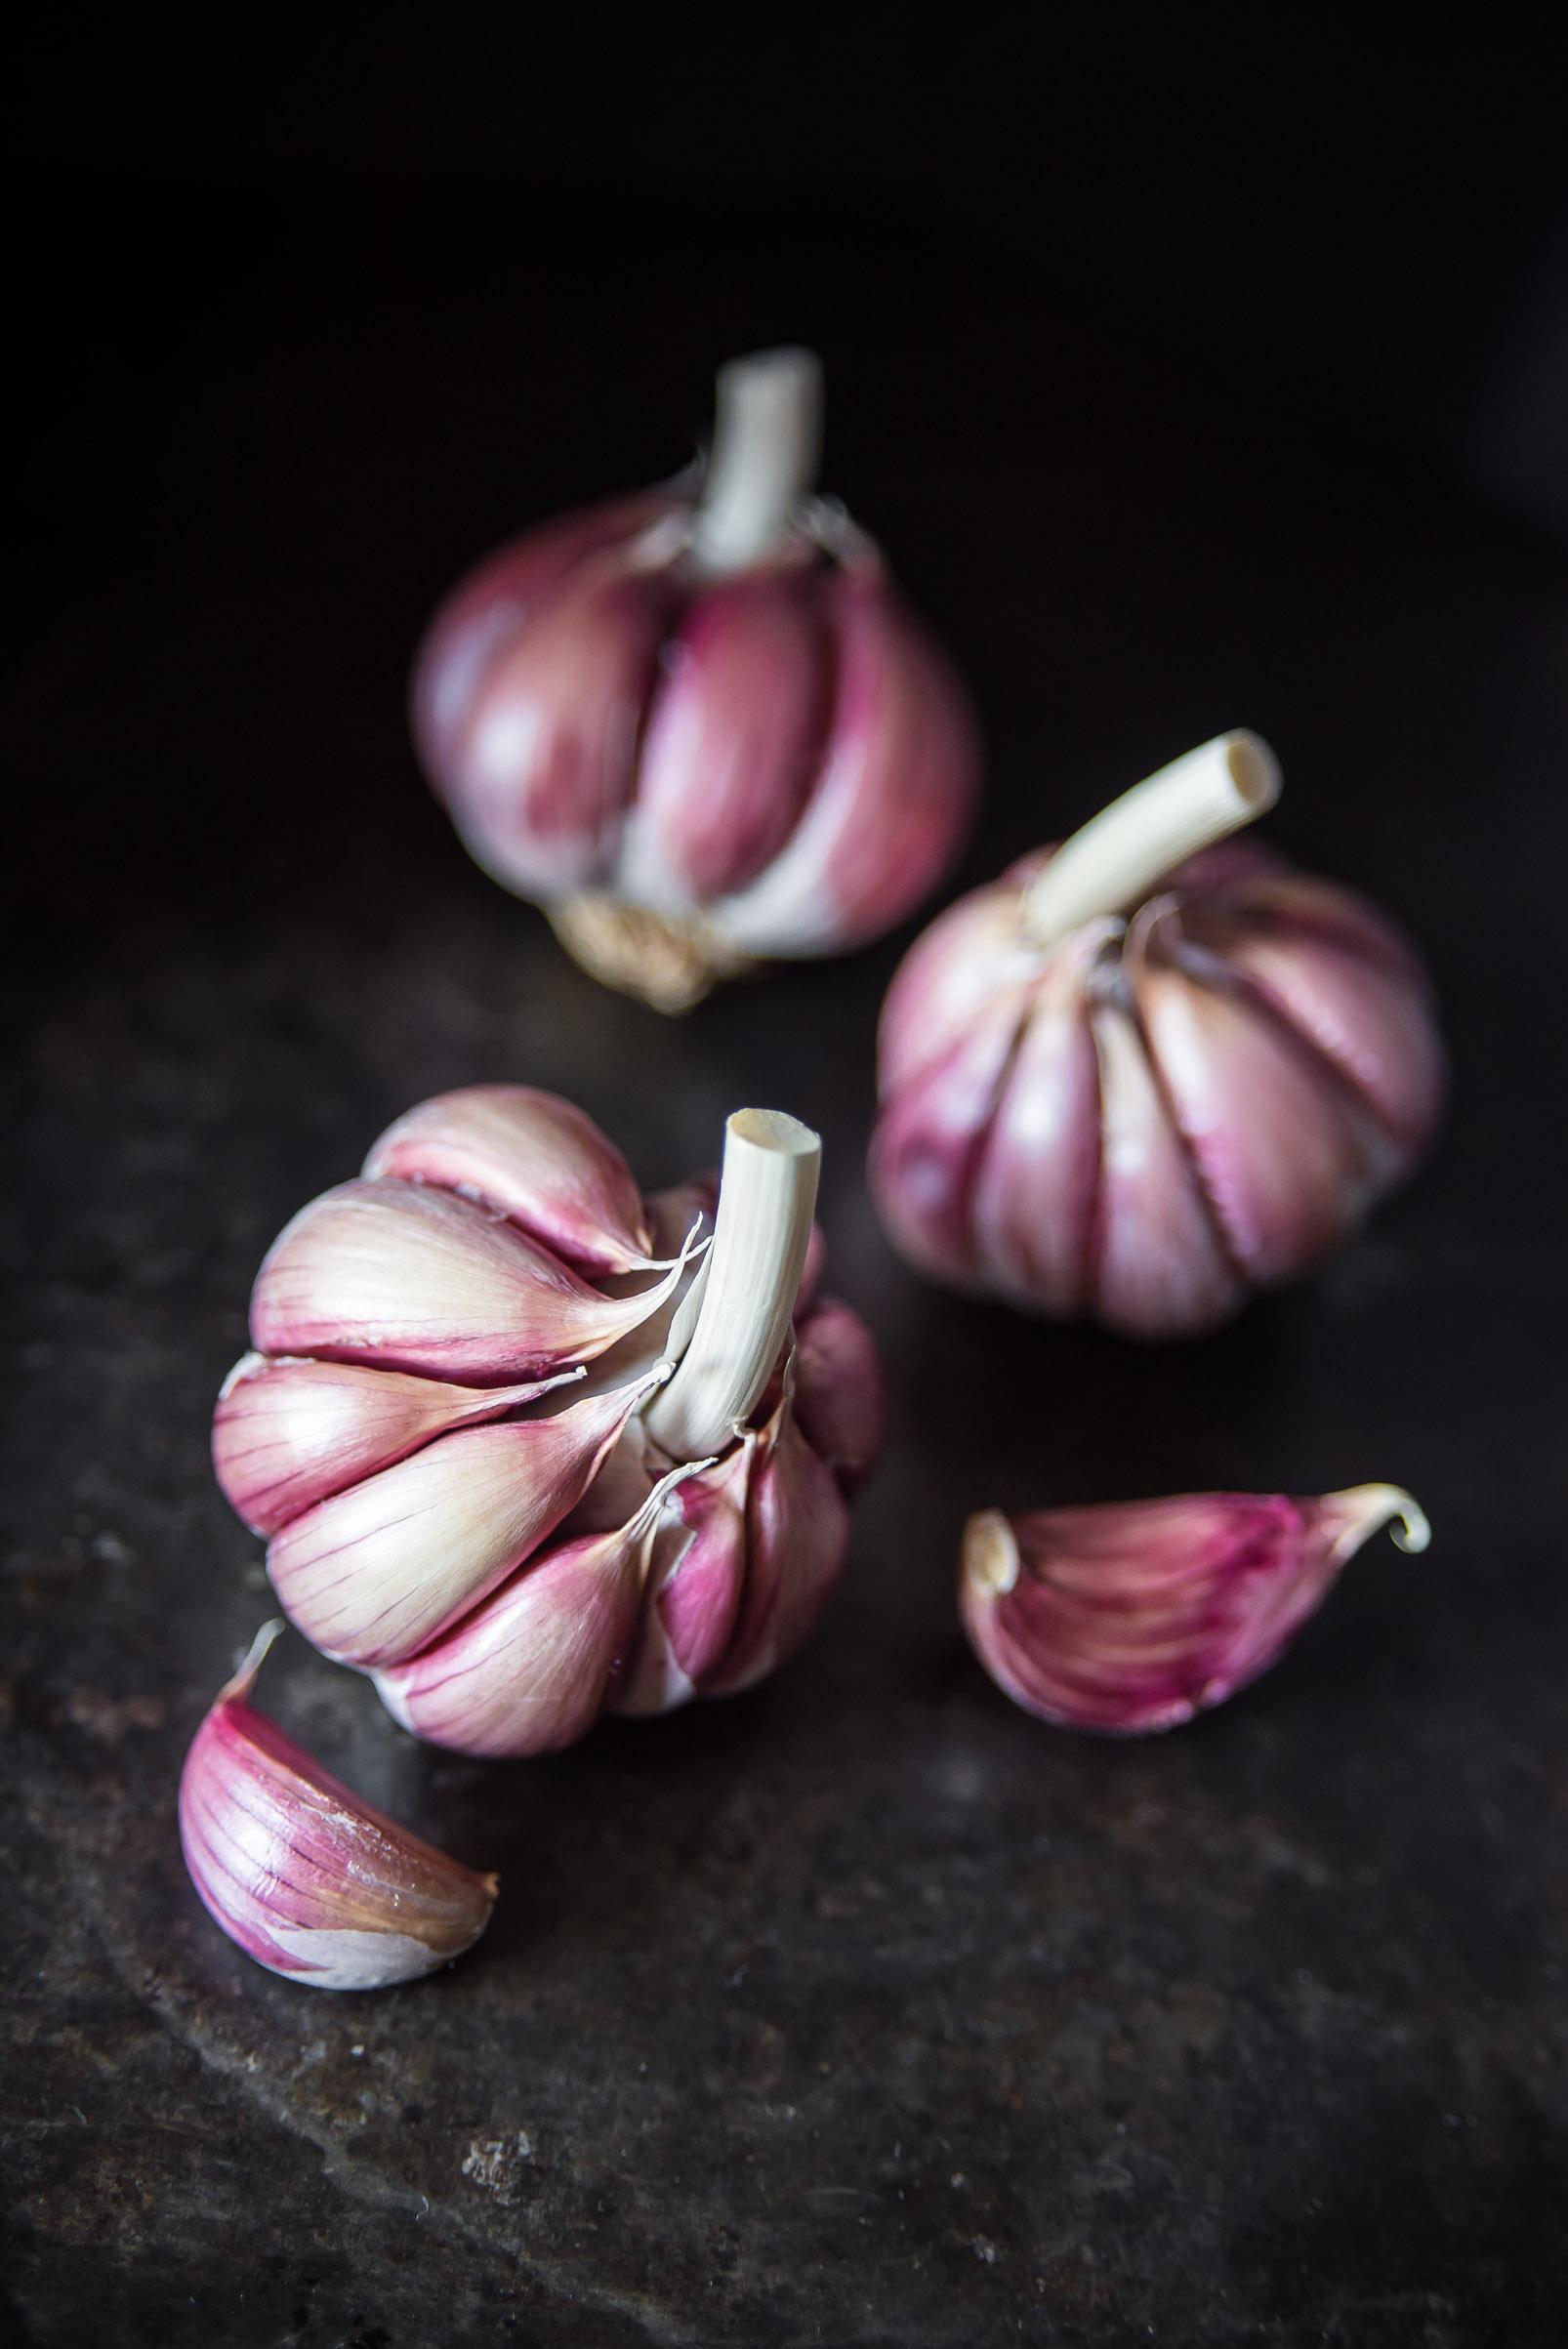 Close up of a beautiful purple garlic bulb on a dark background